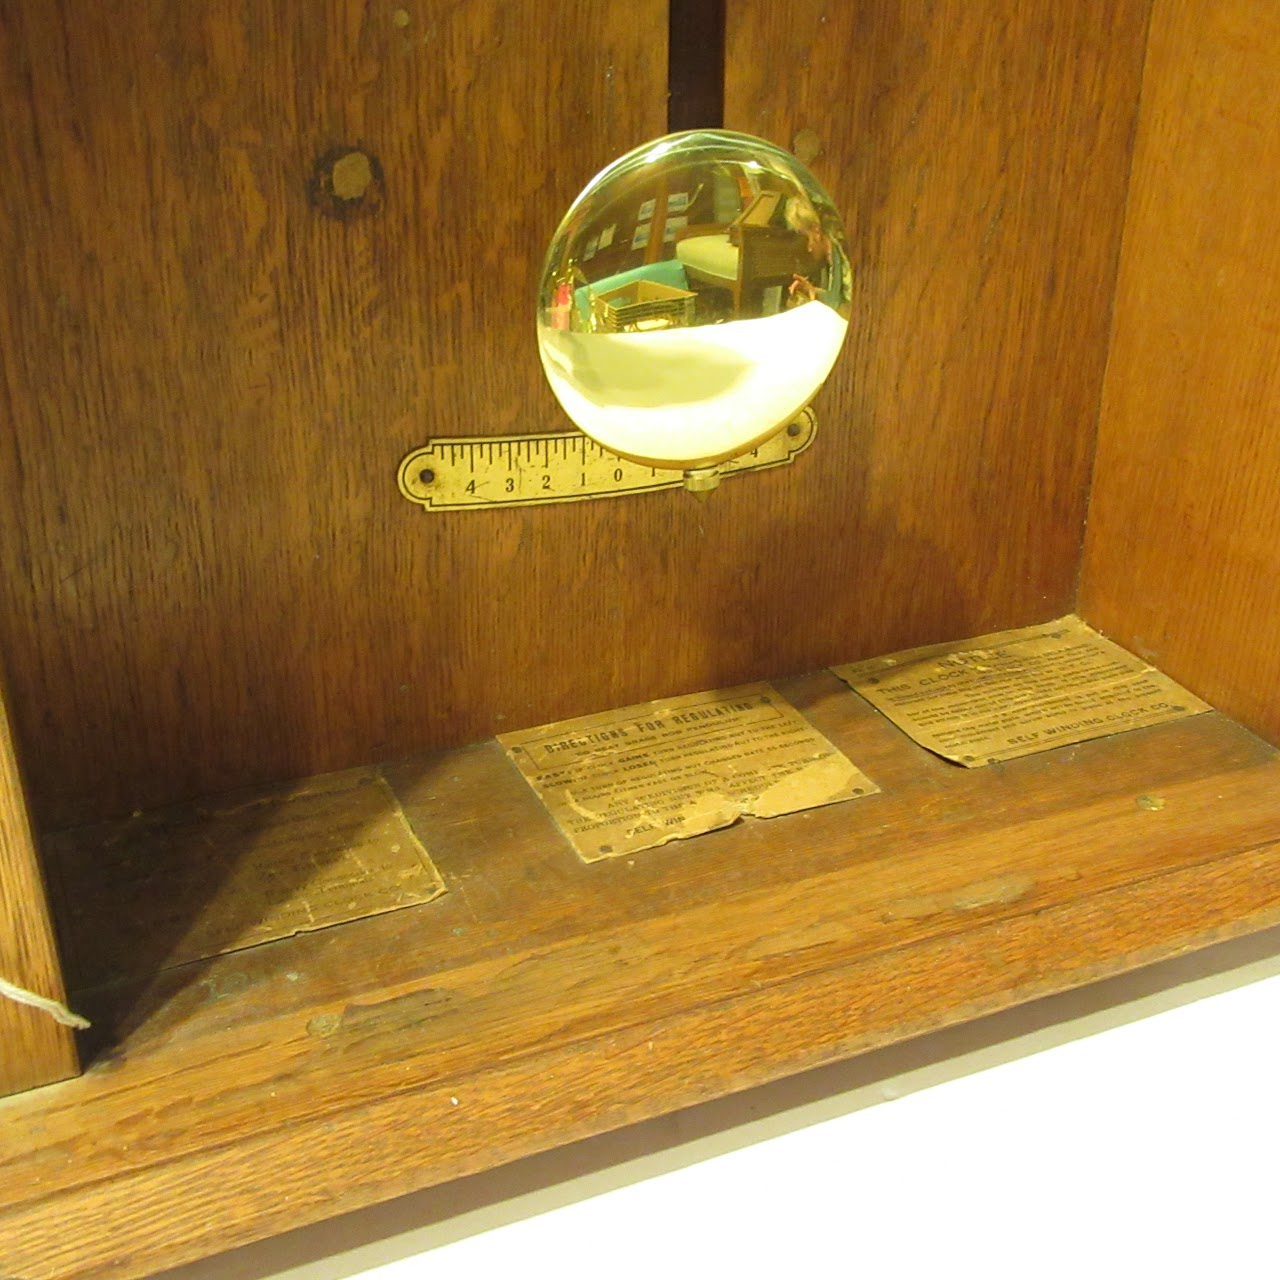 Self Winding Clock Co. Wall Clock | Shophousingworks